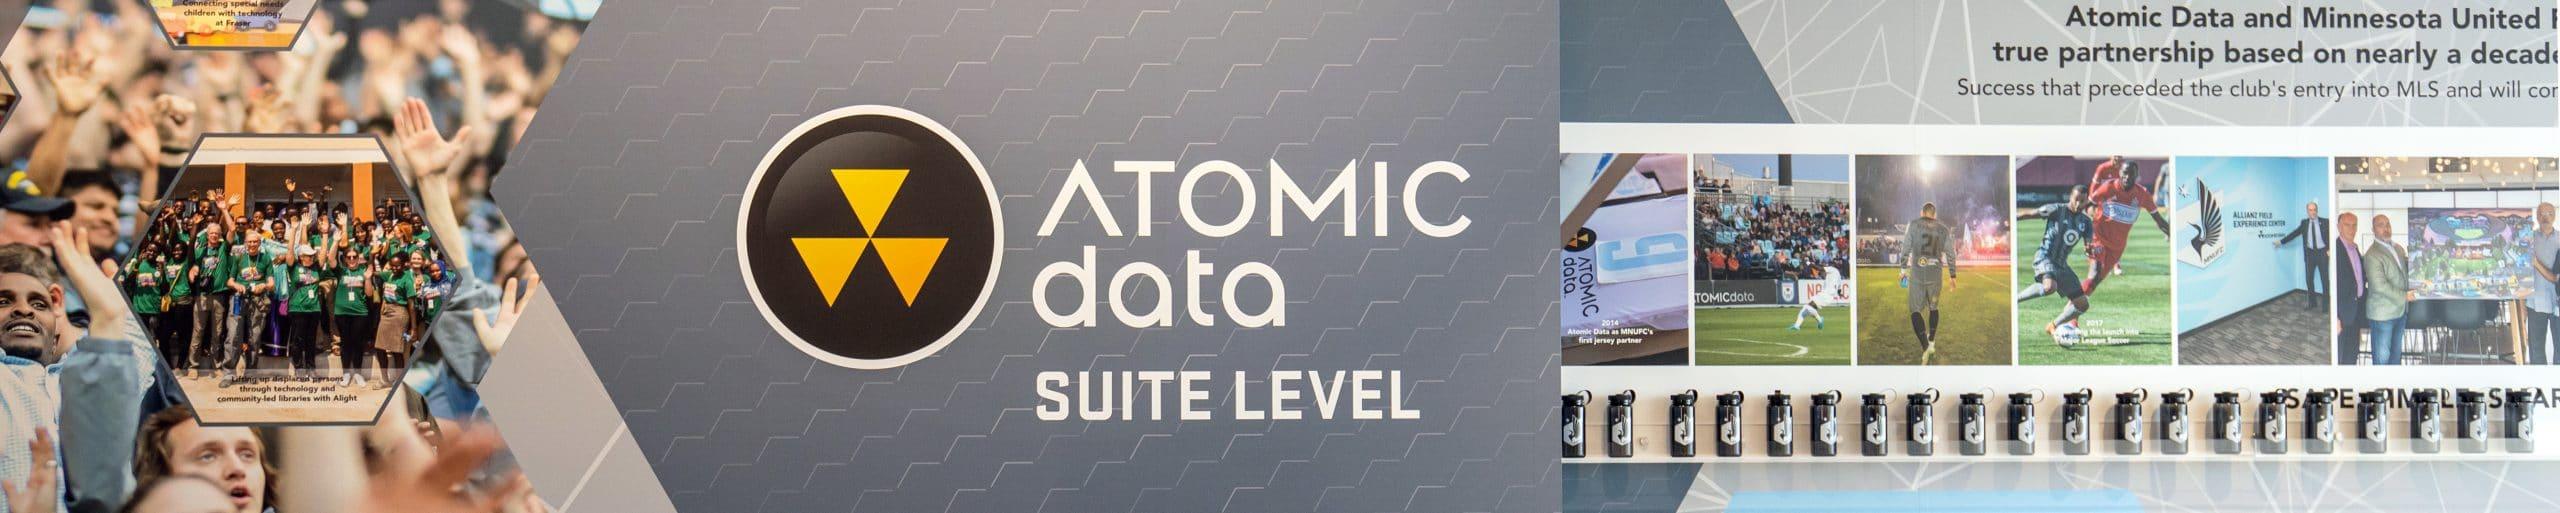 Atomic Data MNUFC Suite Level at Allianz Field